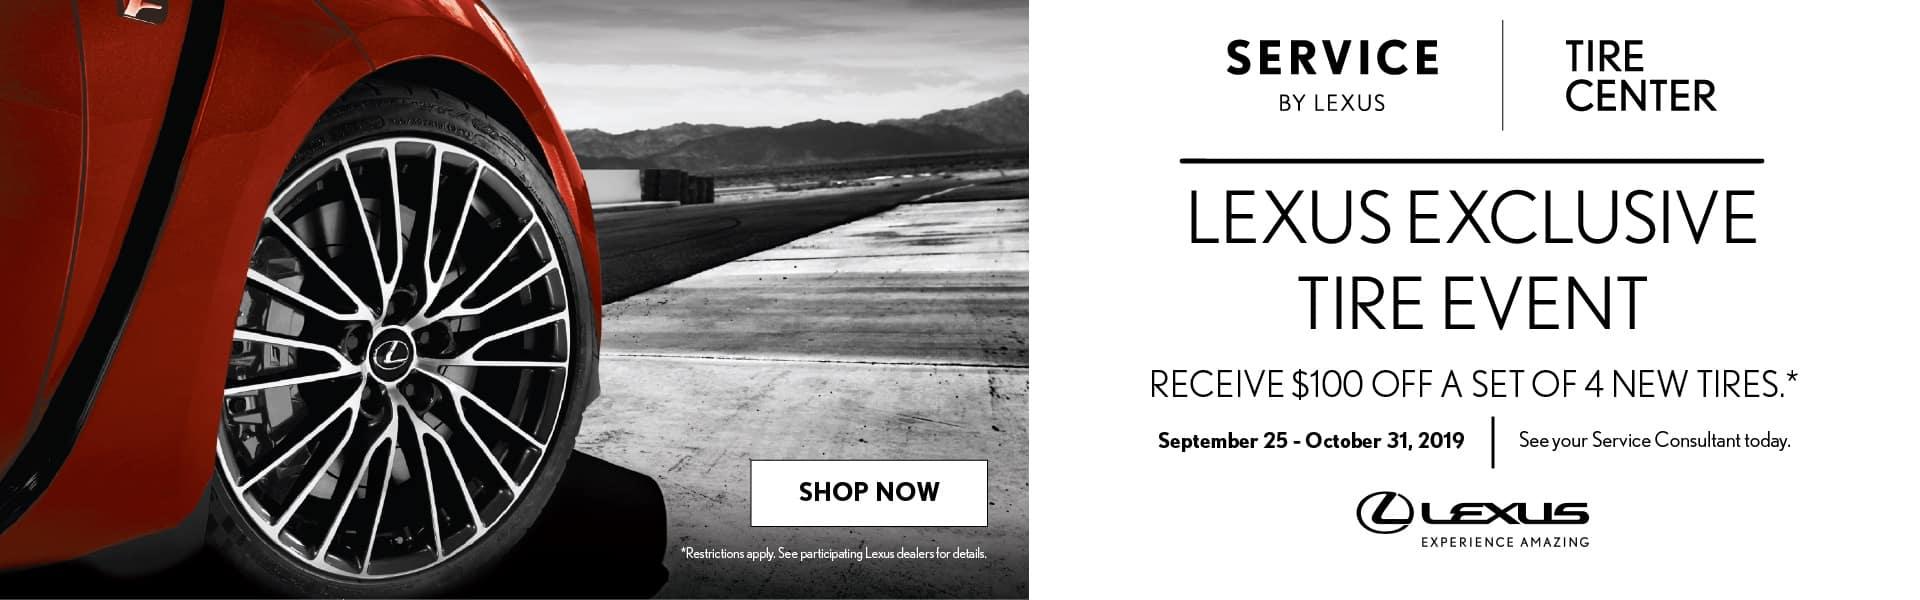 Dealer Daily Lexus >> Lexus Dealer Daily Lexus Of Serramonte 2019 11 08